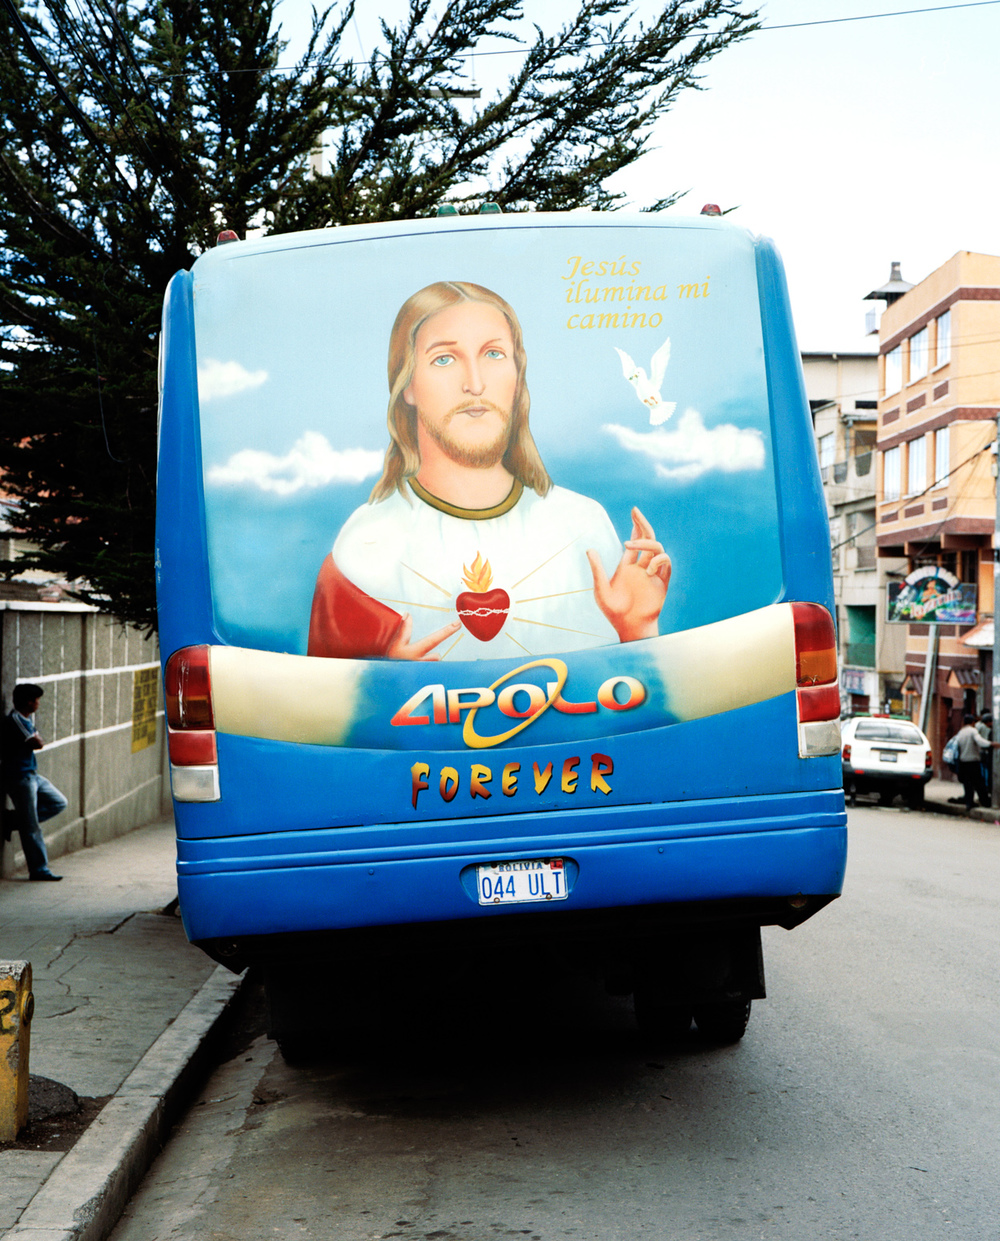 Daniel_Hofer_Bolivian_Busses_199_04_1550PX_WEB.jpg